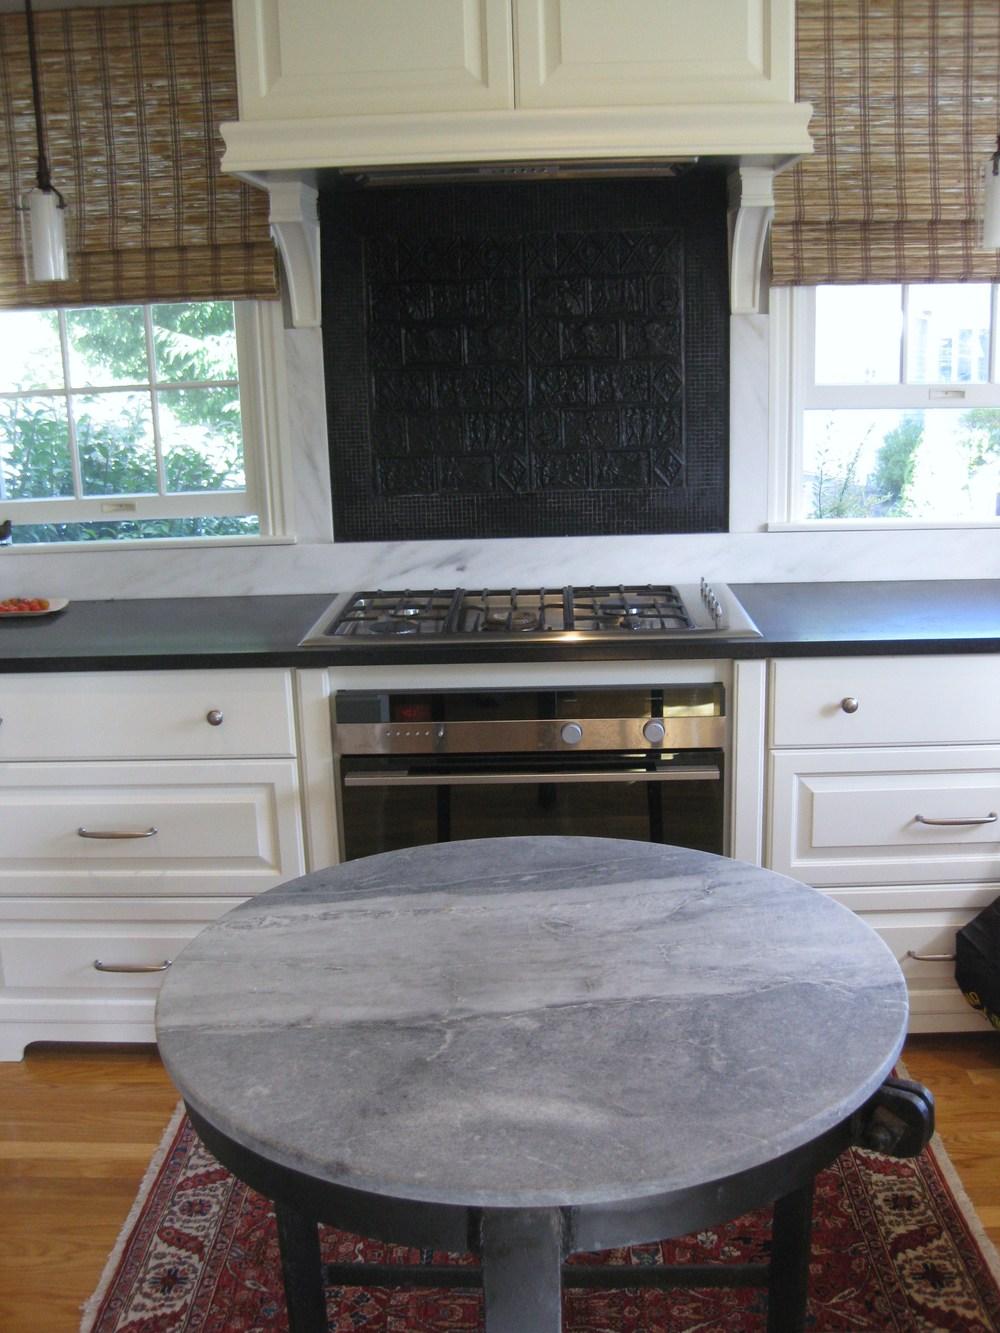 Black Marble Border Surrounding Cast Iron Fireplace Panels